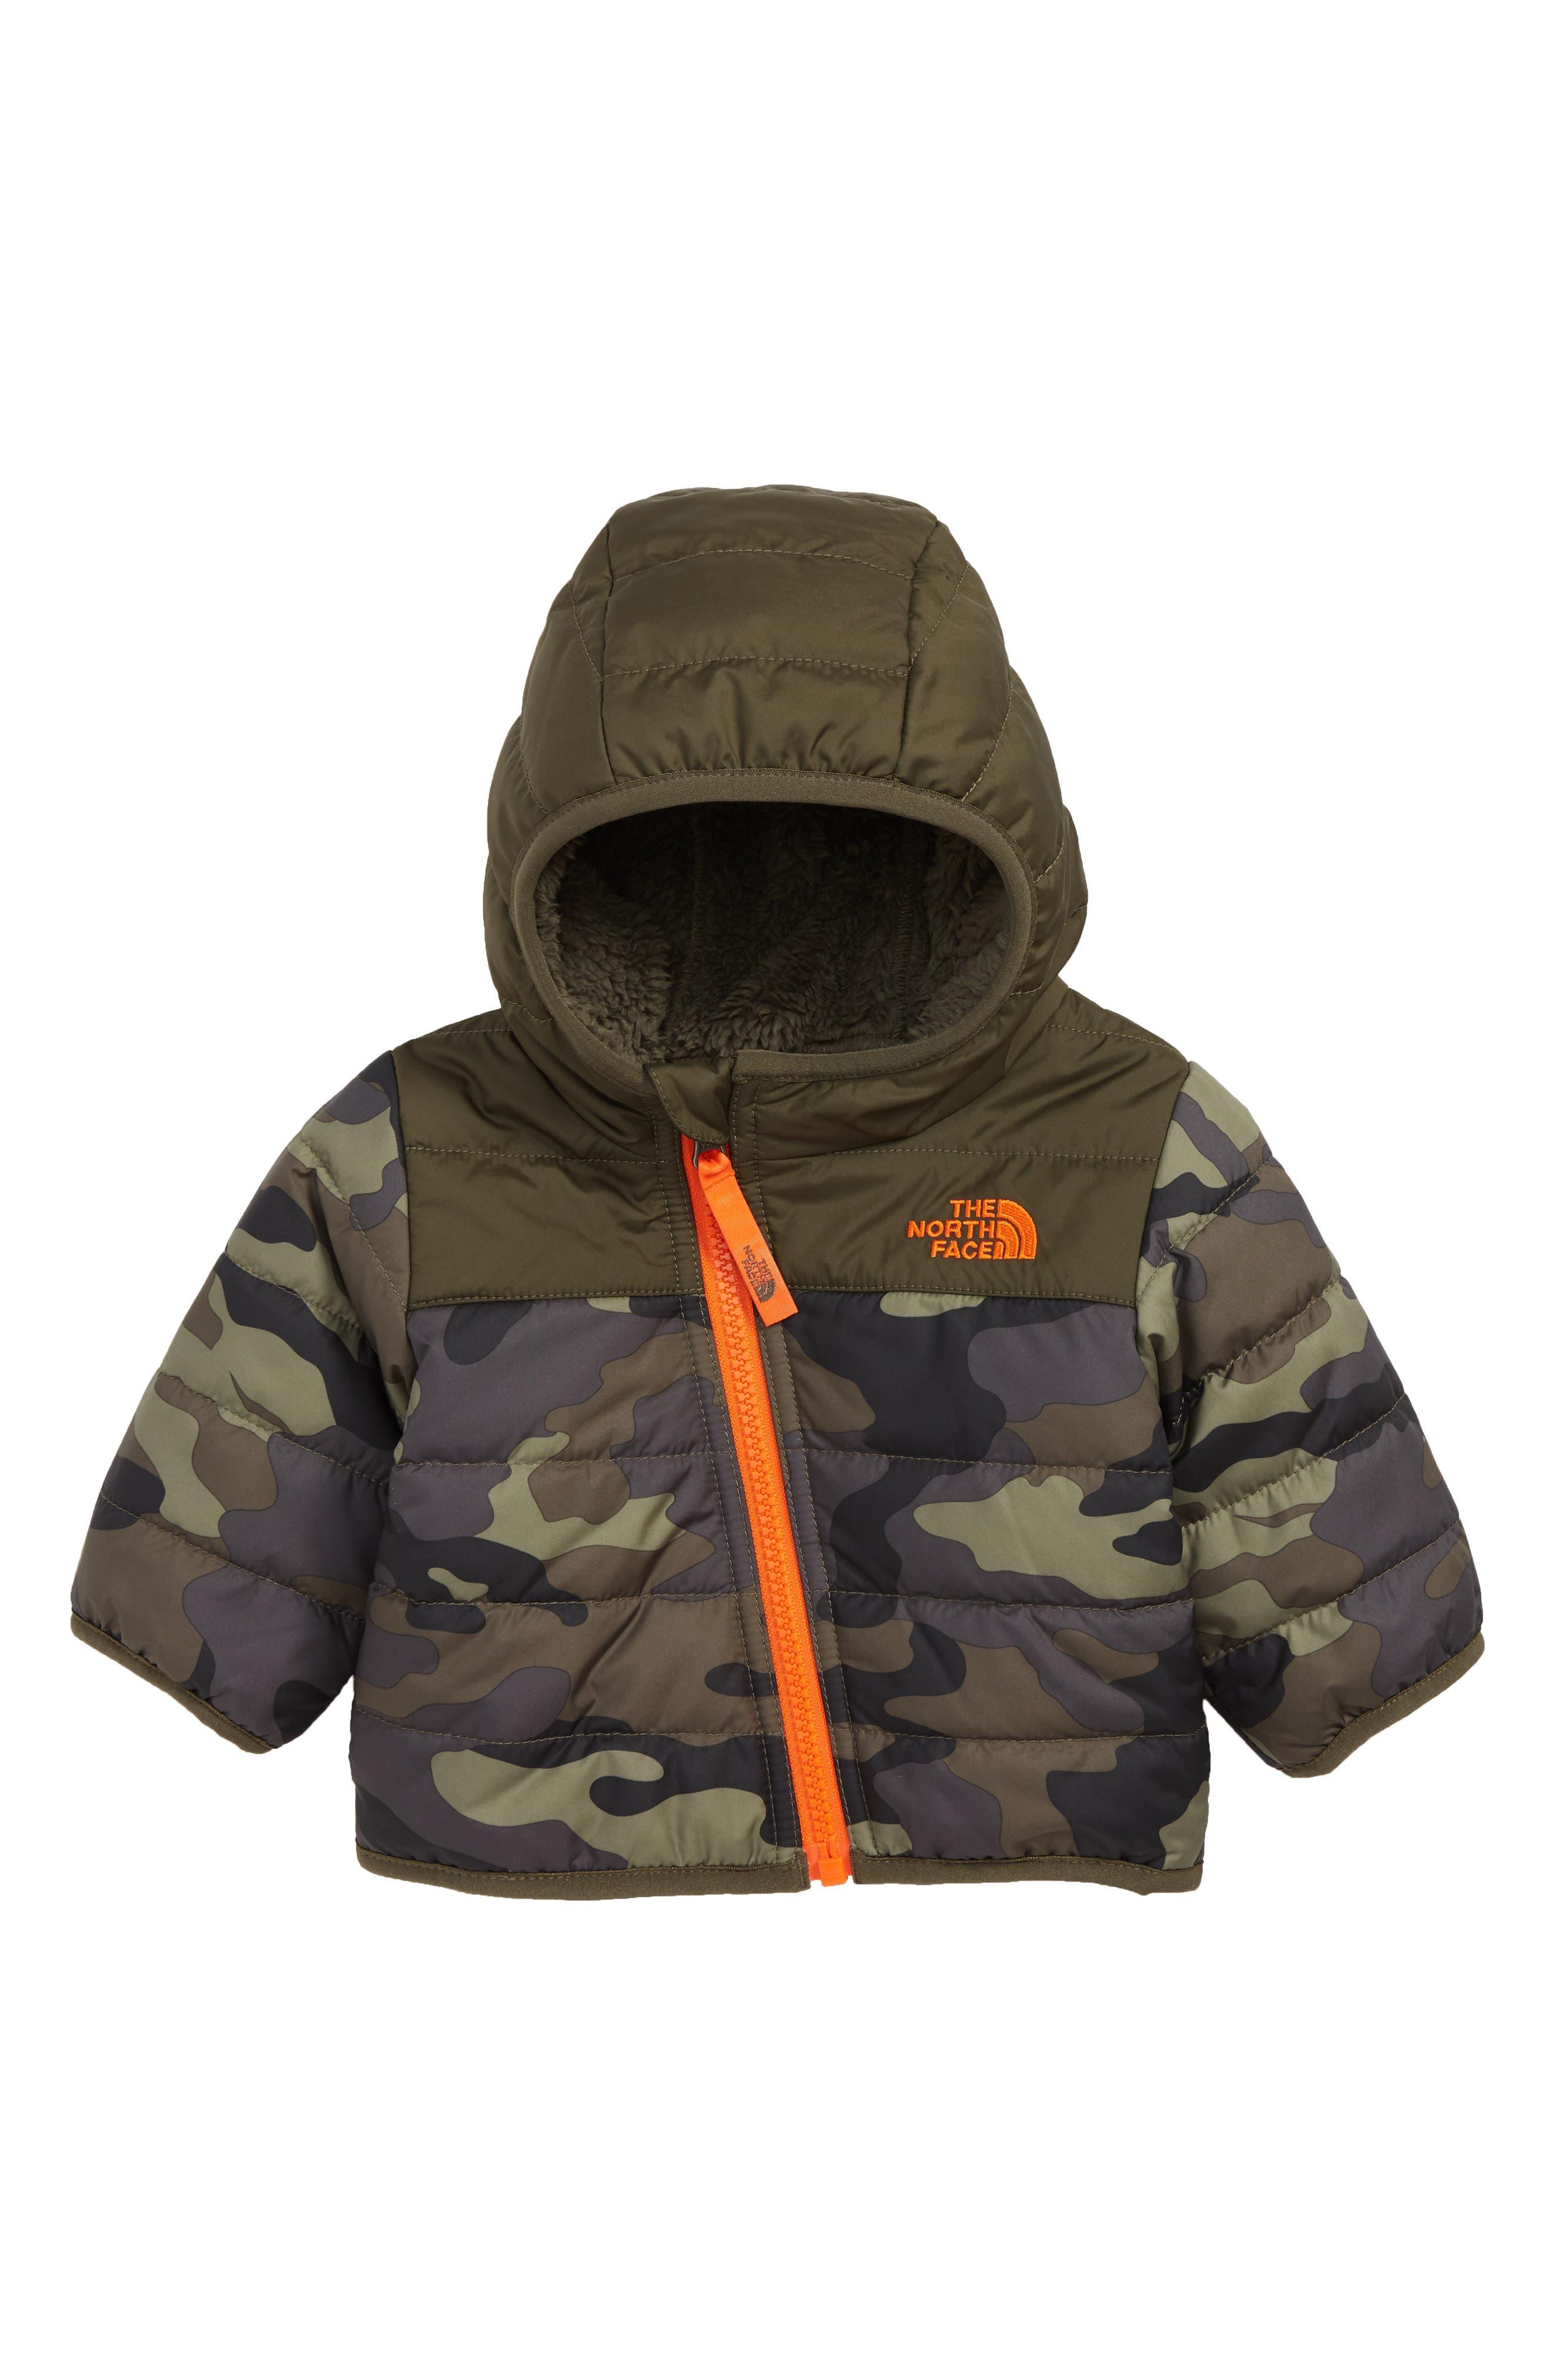 Mount Chimborazo Reversible Jacket,                         Main,                         color, TAUPE/ GREEN CAMO PRINT